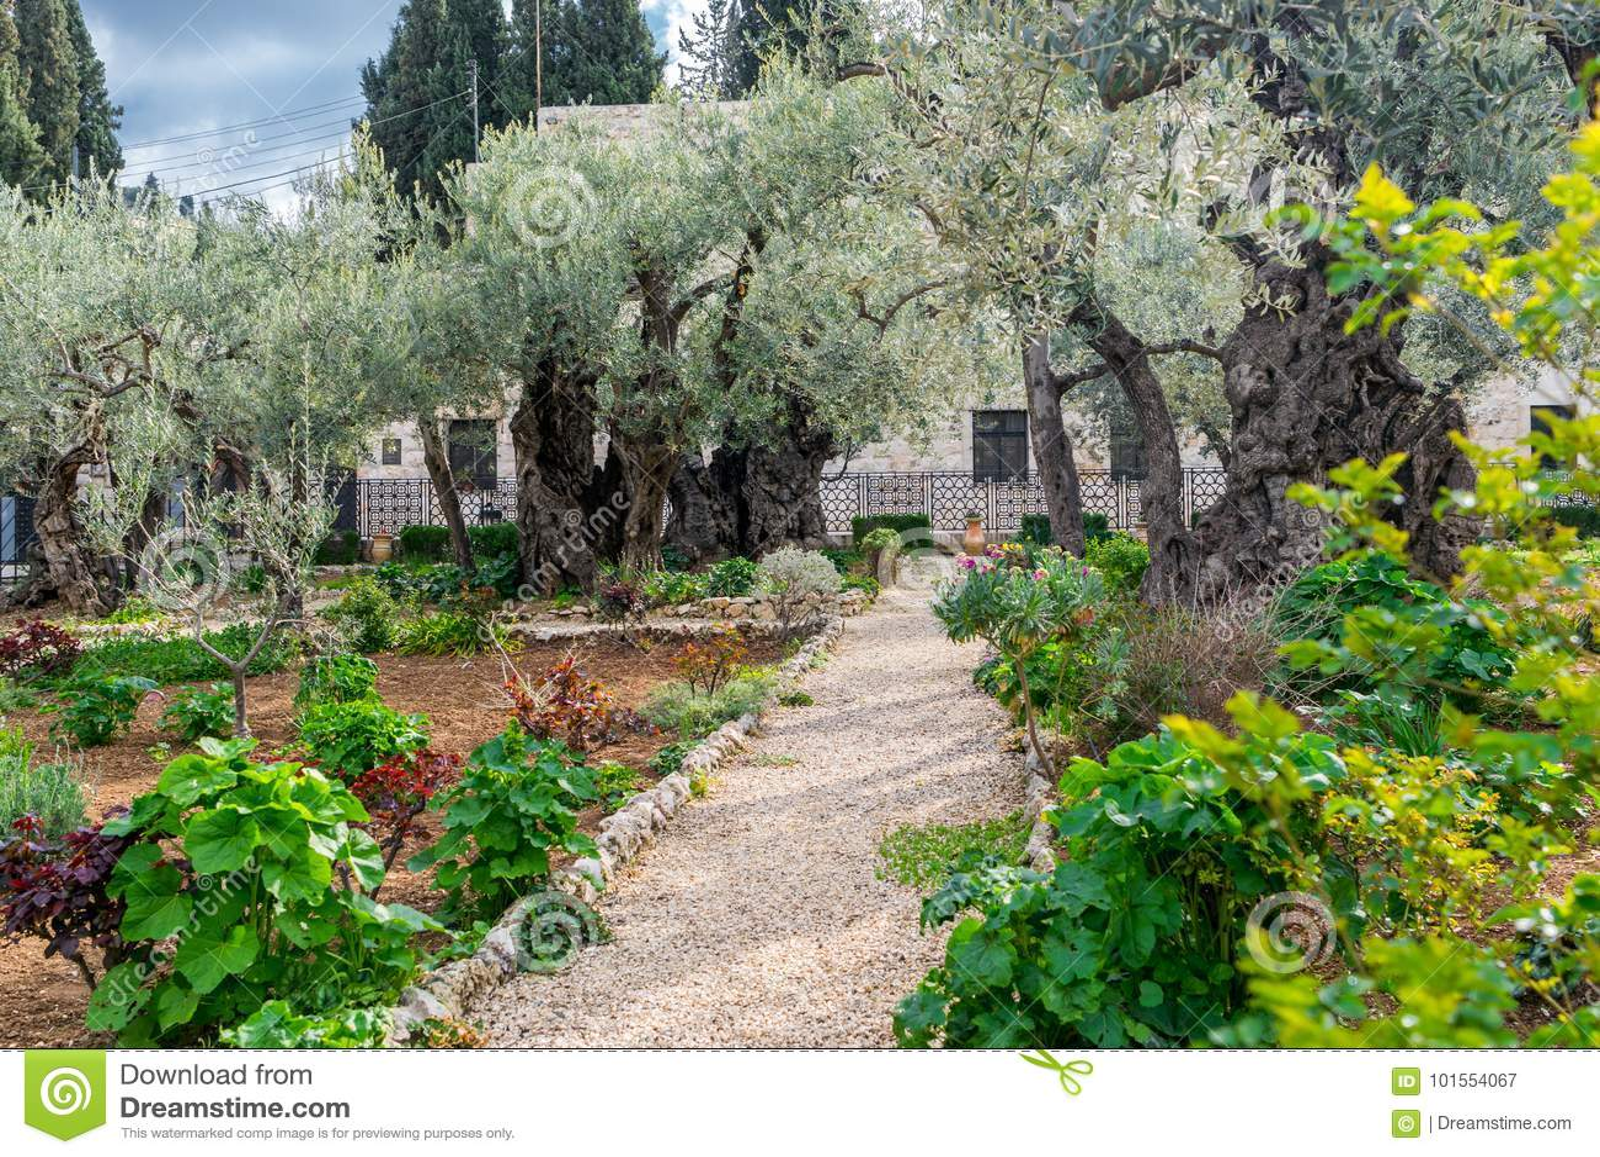 Download Garden Of Gethsemane   Pathwalk Stock Image   Image Of Blood,  Gethsemane: 101554067